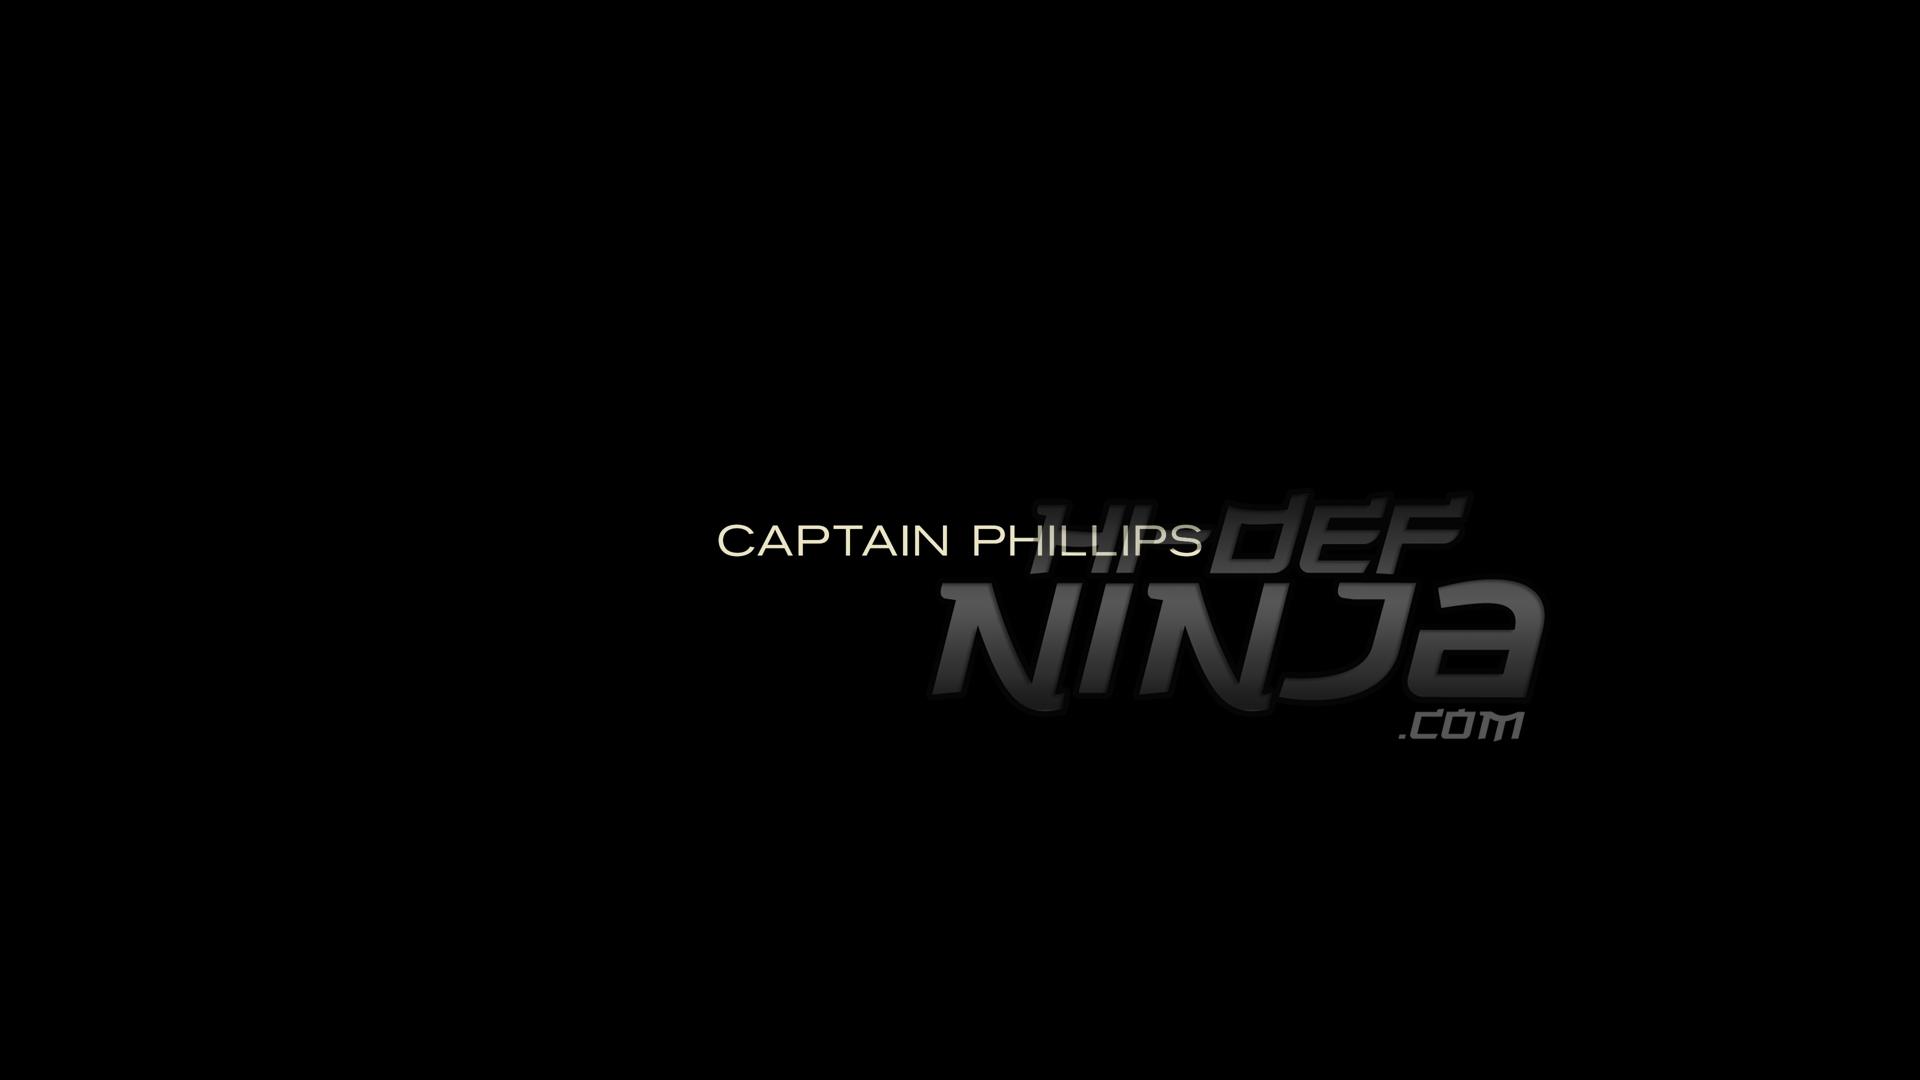 Capt Phillips 01